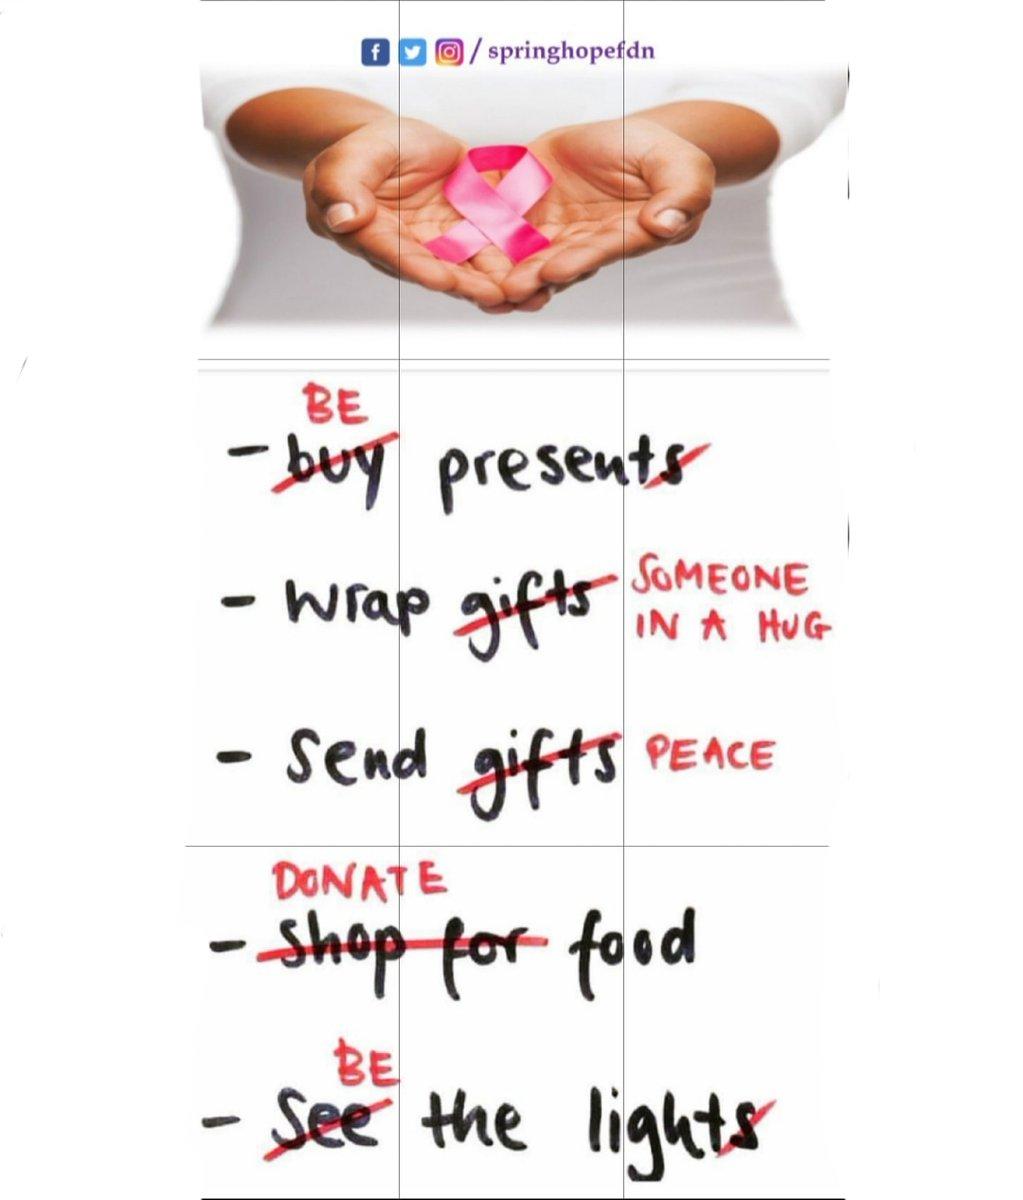 Just be #present, give a #hug, be #calm, give or share #food and be #light. बस मौजूद रहें, गले लगाएं, शांत रहें, भोजन दें या साझा करें और हल्का रहें। ____ #HealthForAll #bestrong #inspire #thinkpositive #selflove #selfcare #livelovelaugh #livelife https://t.co/KqvZK2jKim